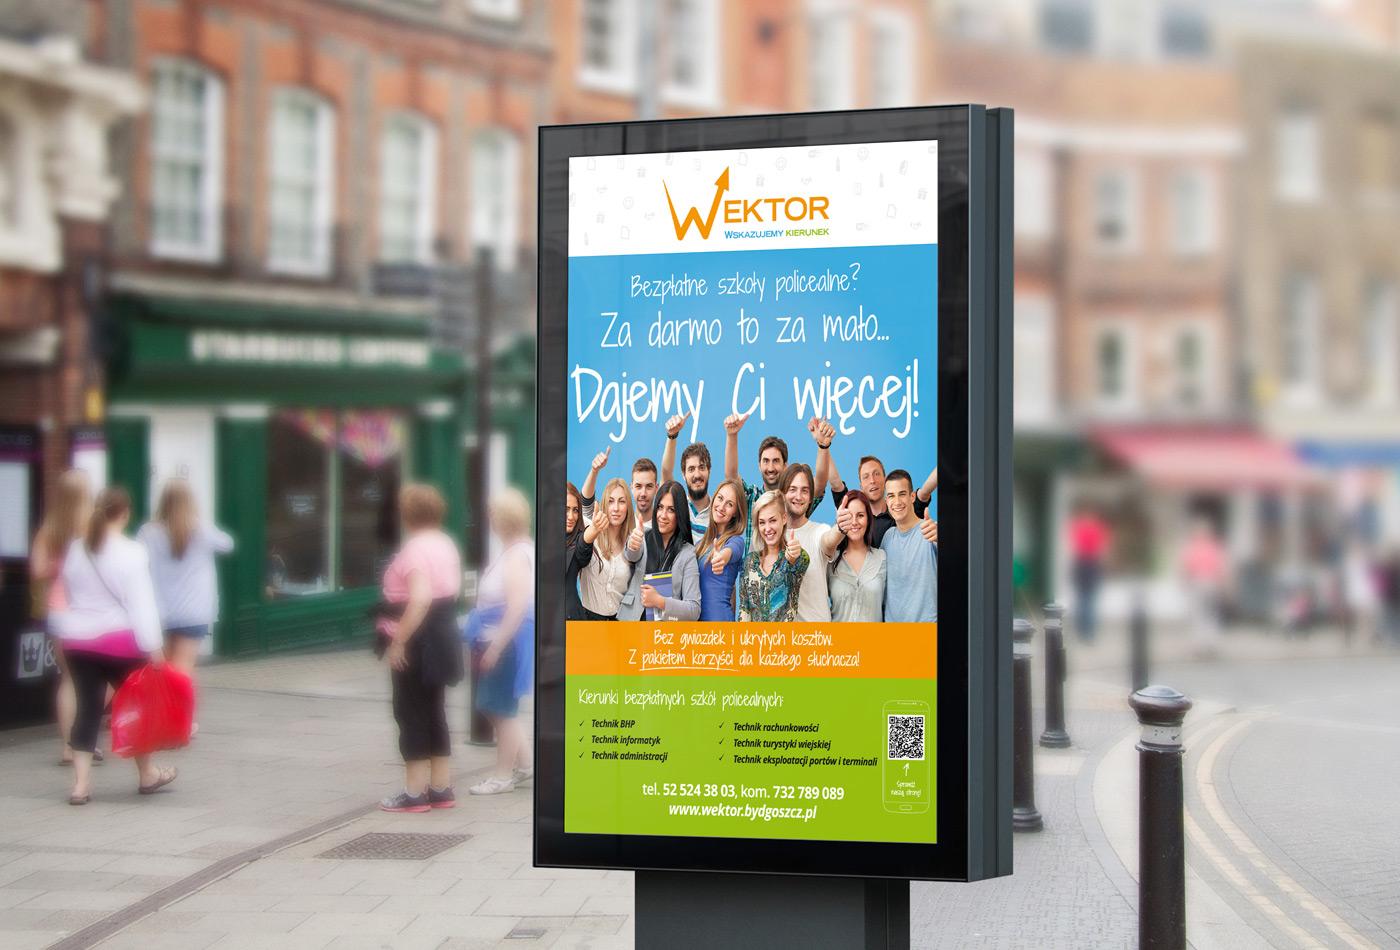 wektor-billboard